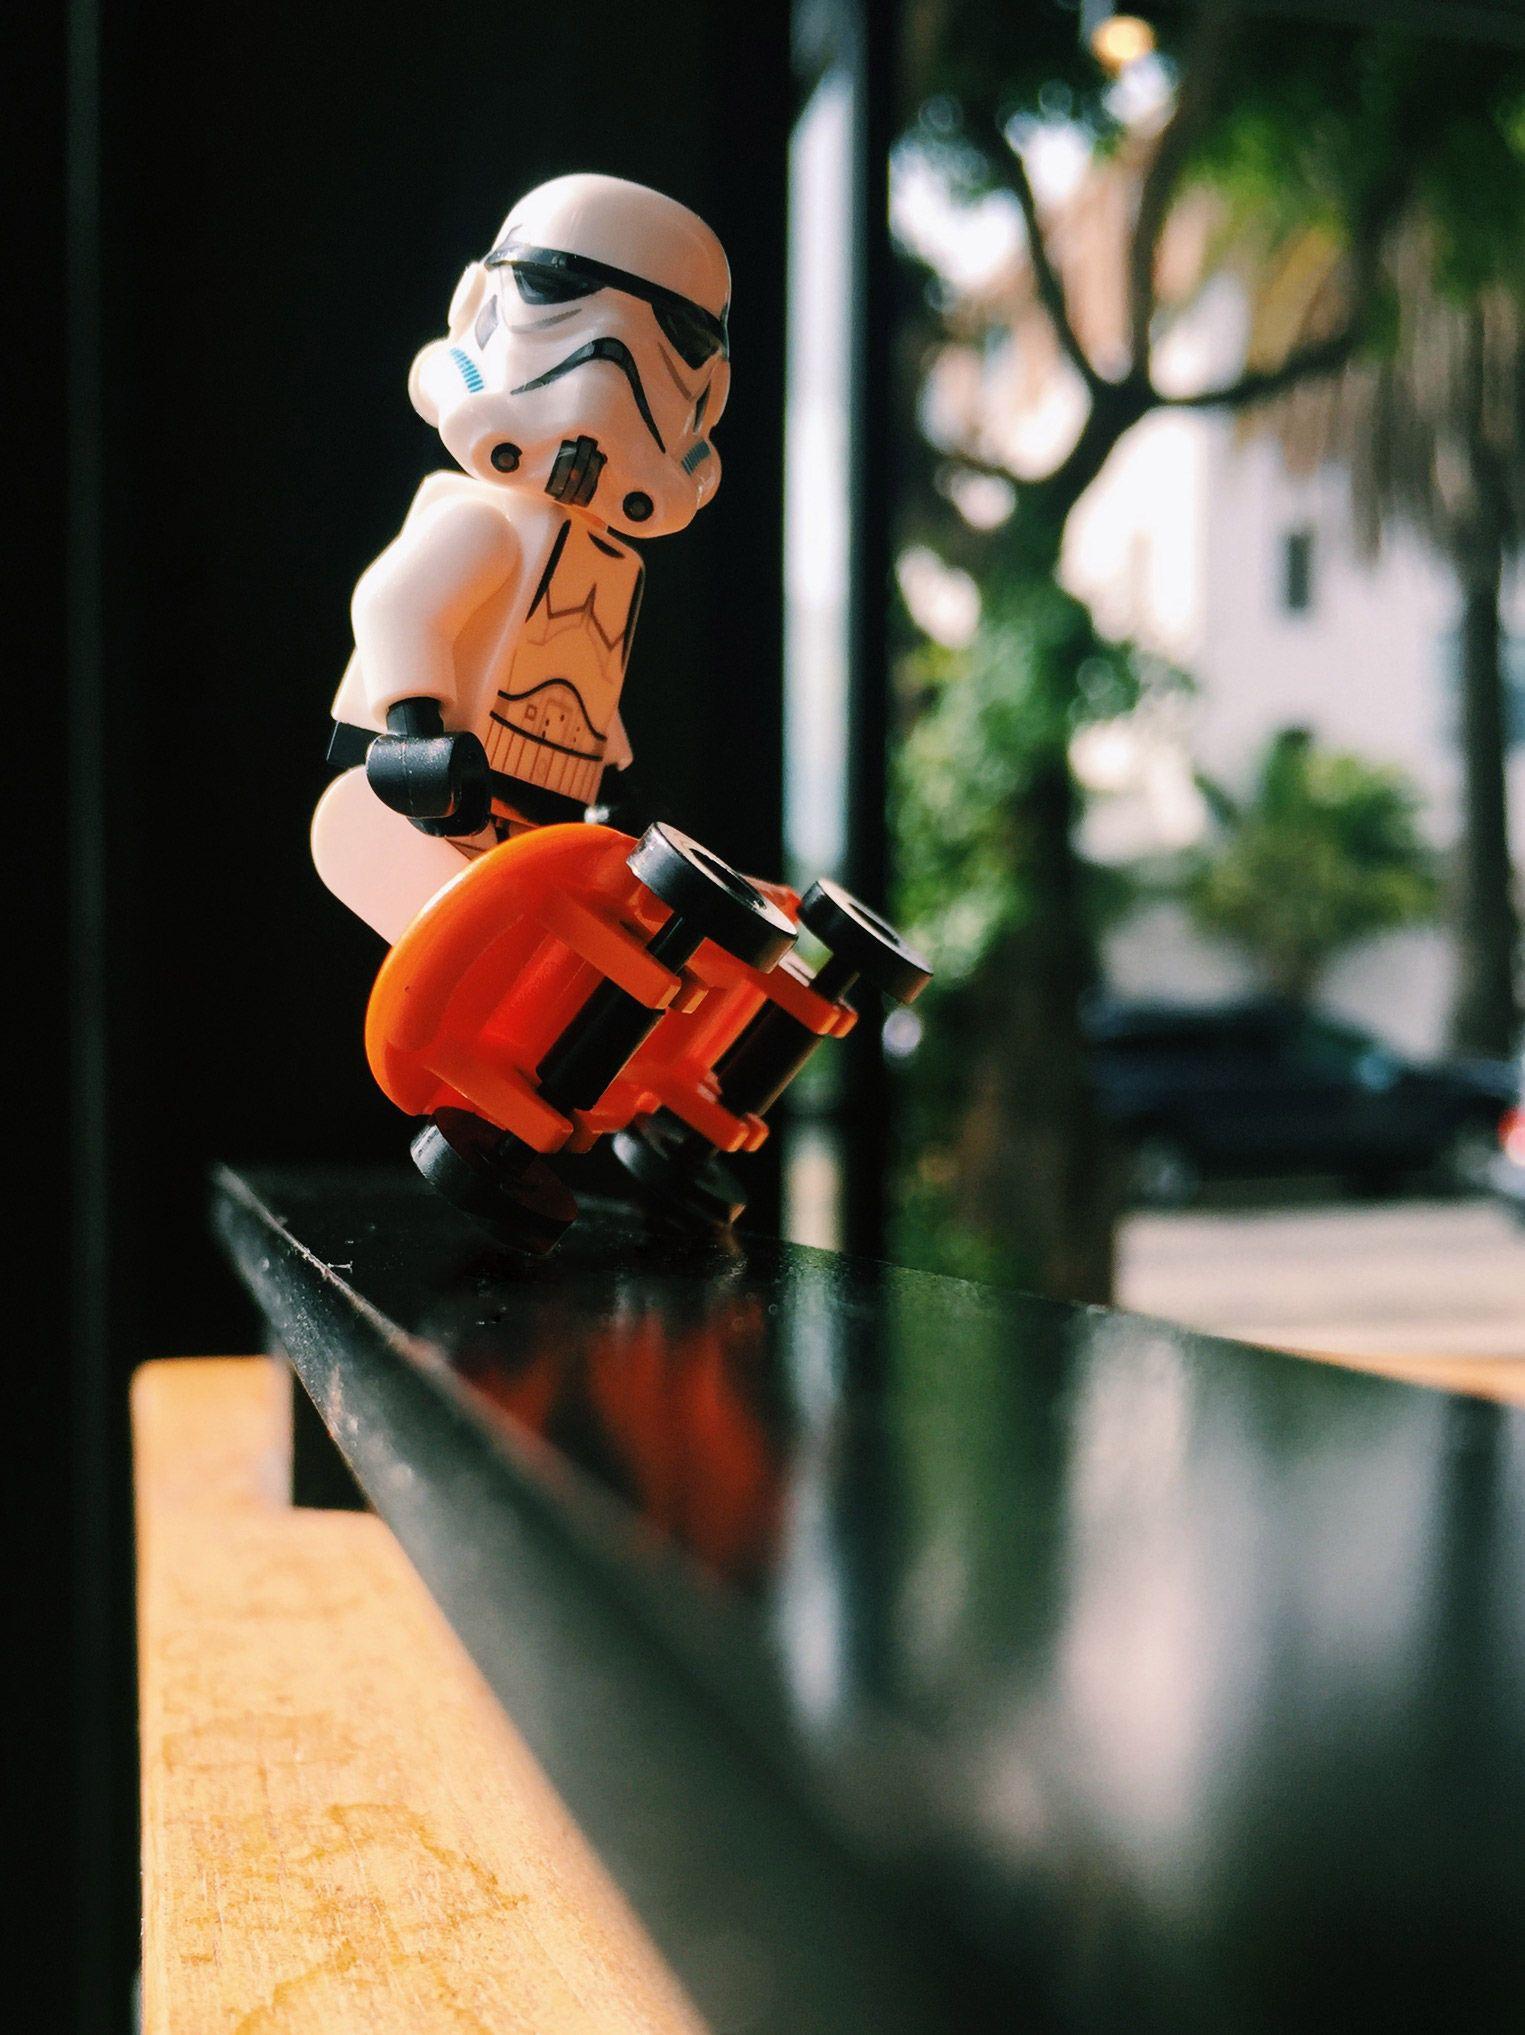 Pin By Tata On Lego Lego War Lego Stormtrooper Star Wars Nerd